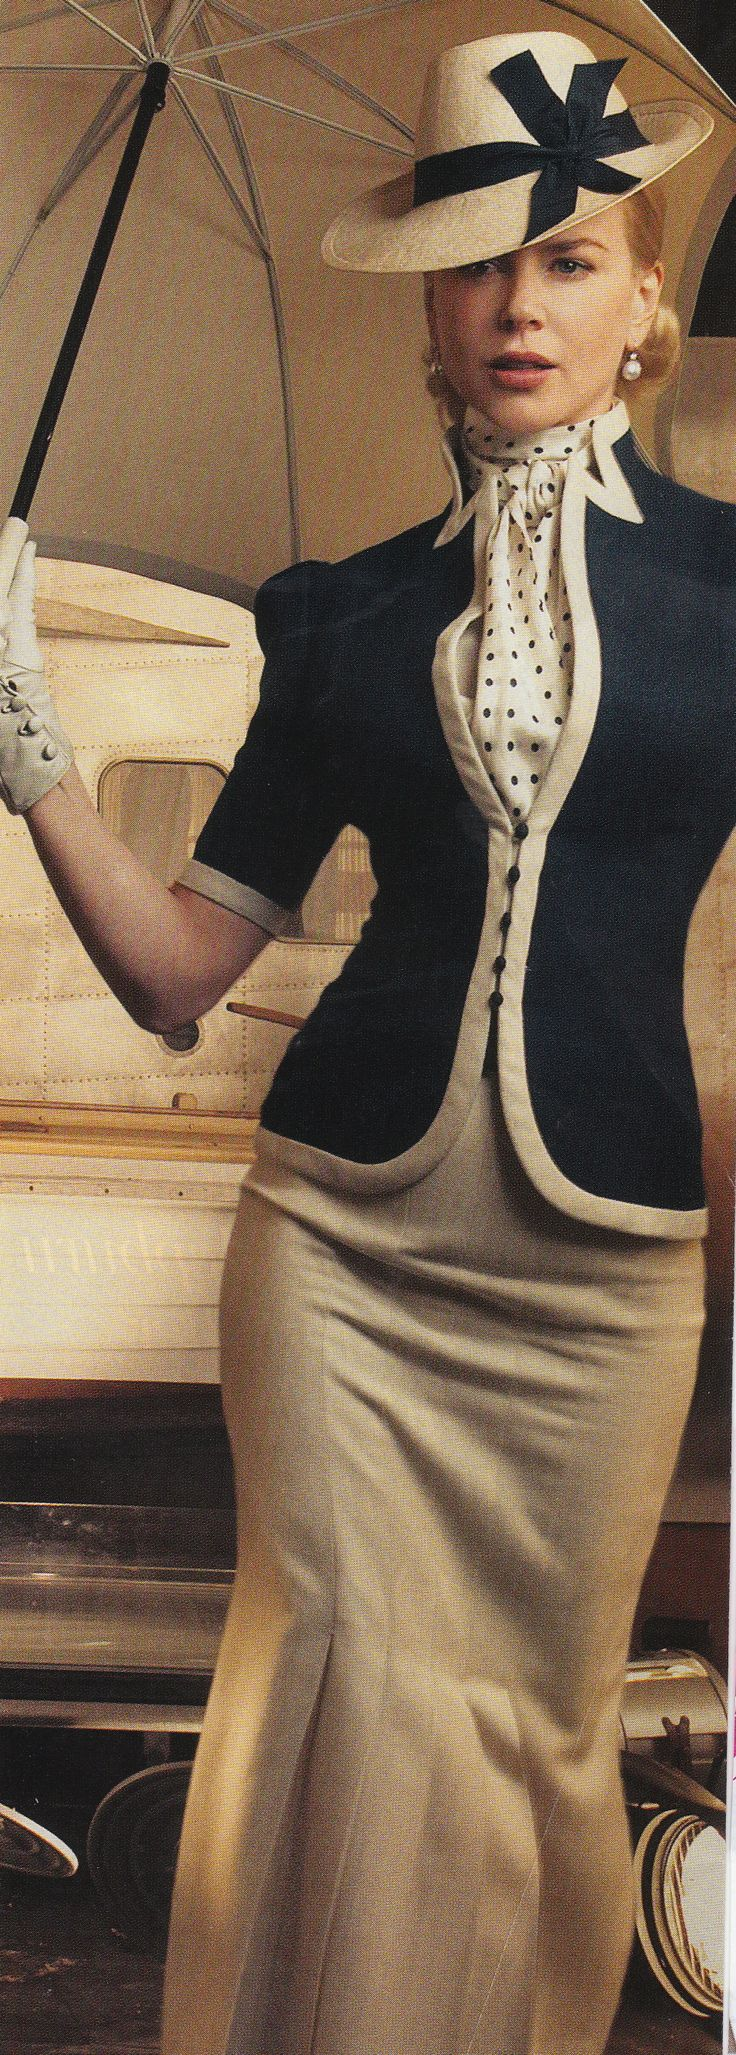 "Nicole Kidman in ""Australia"" ~ great costumes ~"